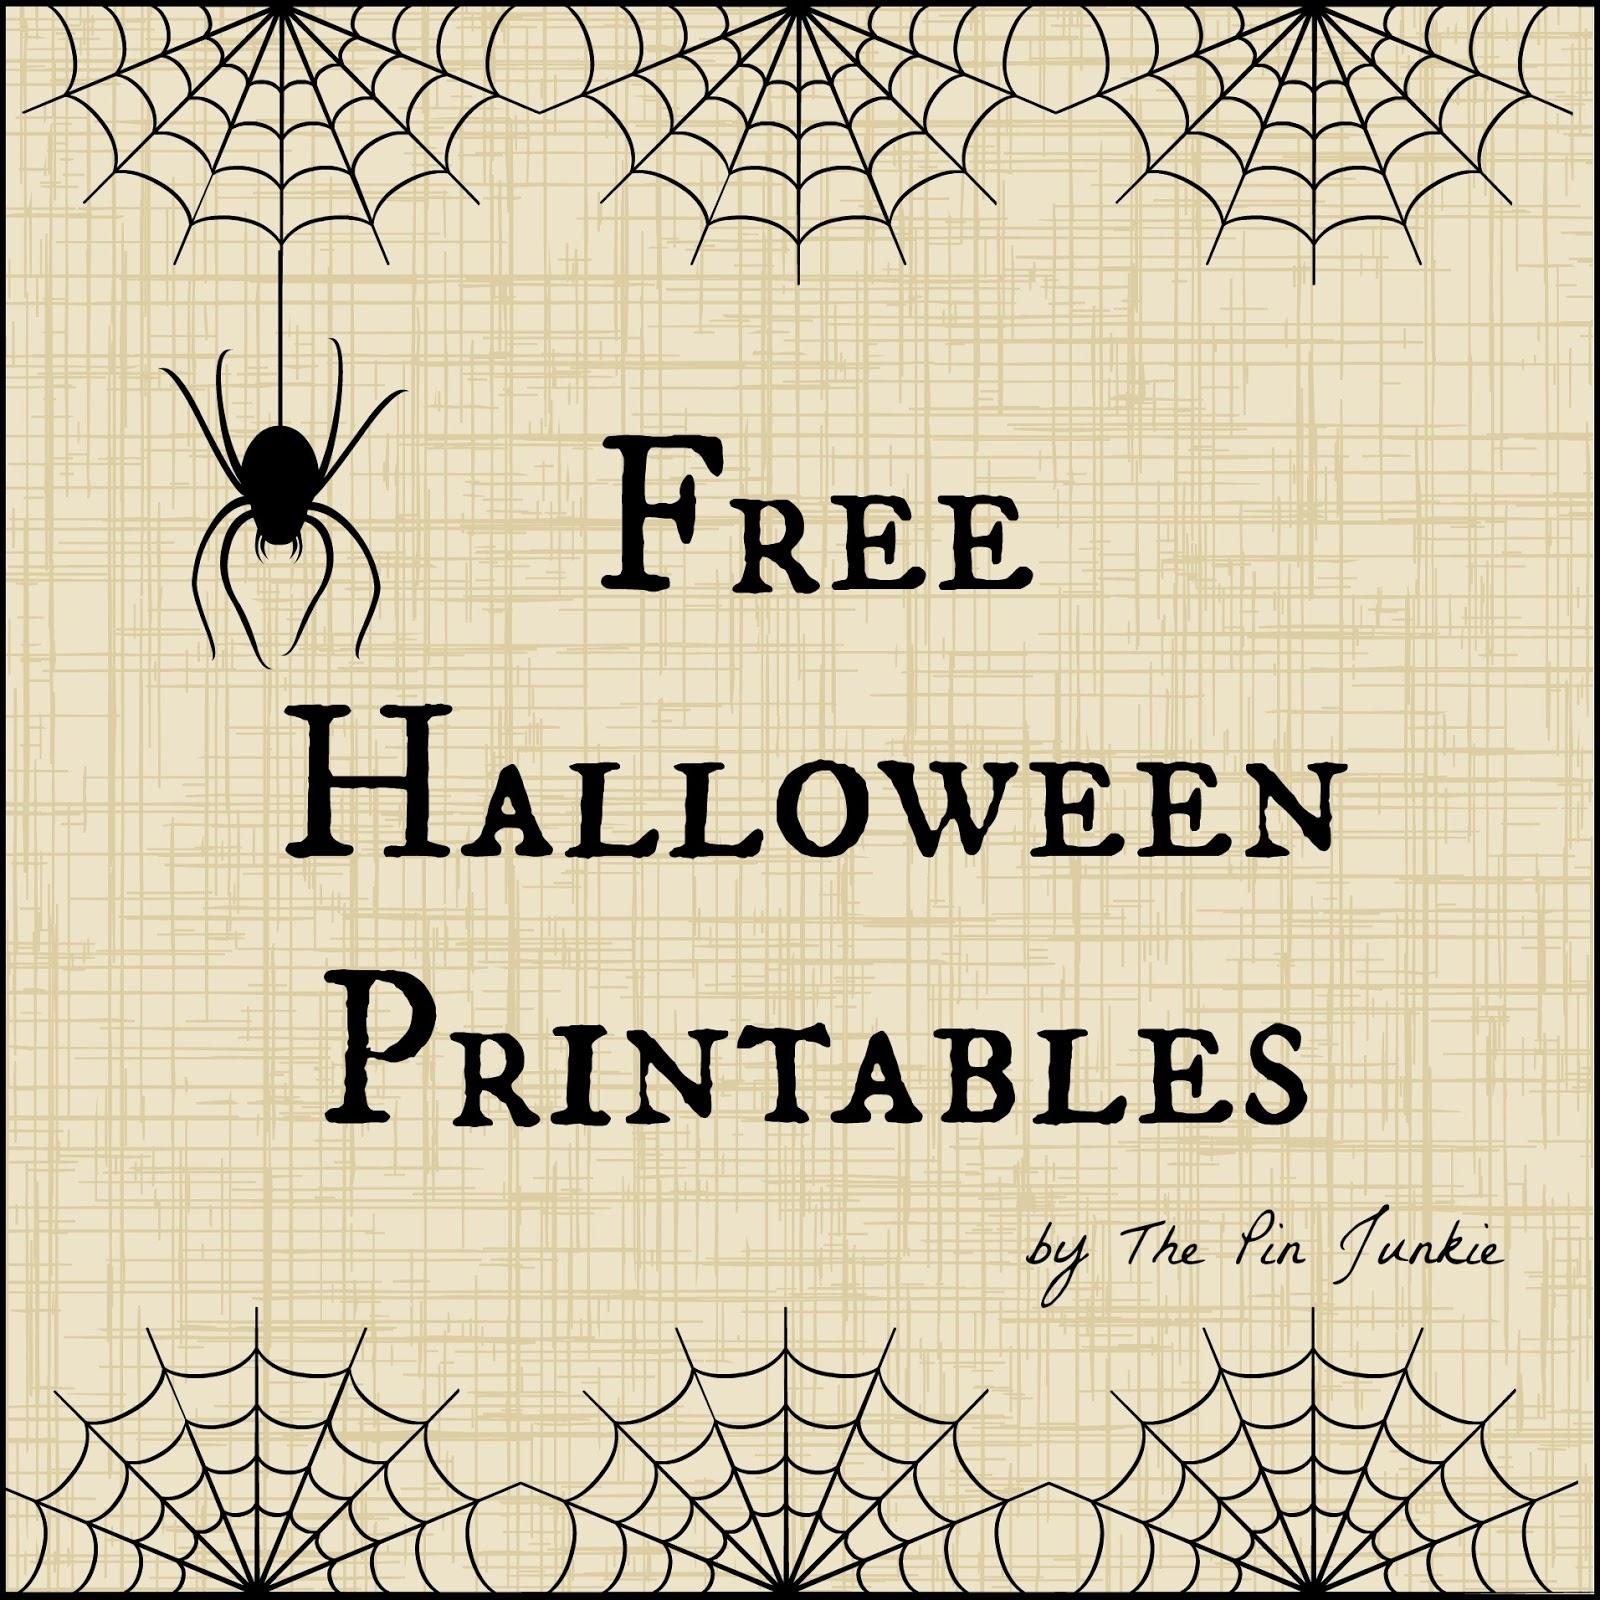 Free Halloween Printables - Free Halloween Printables